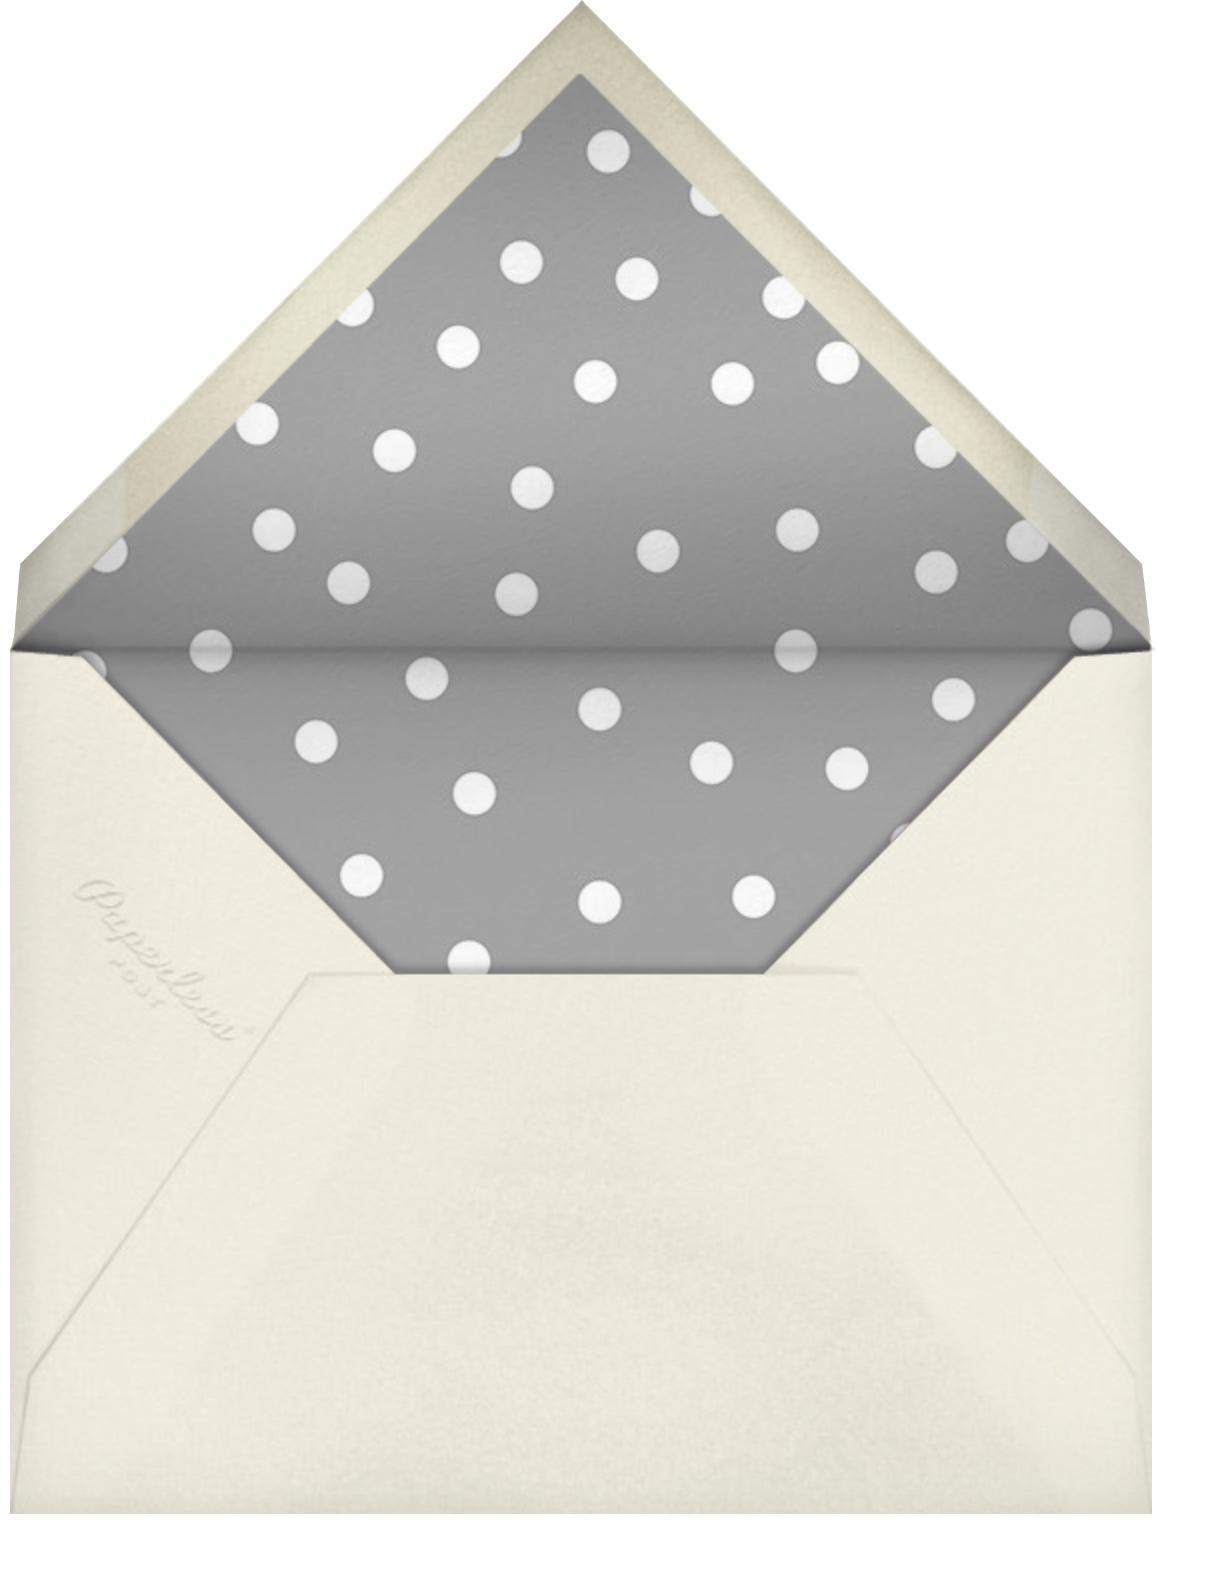 Snowballs - Greeting - The Indigo Bunting - Holiday cards - envelope back